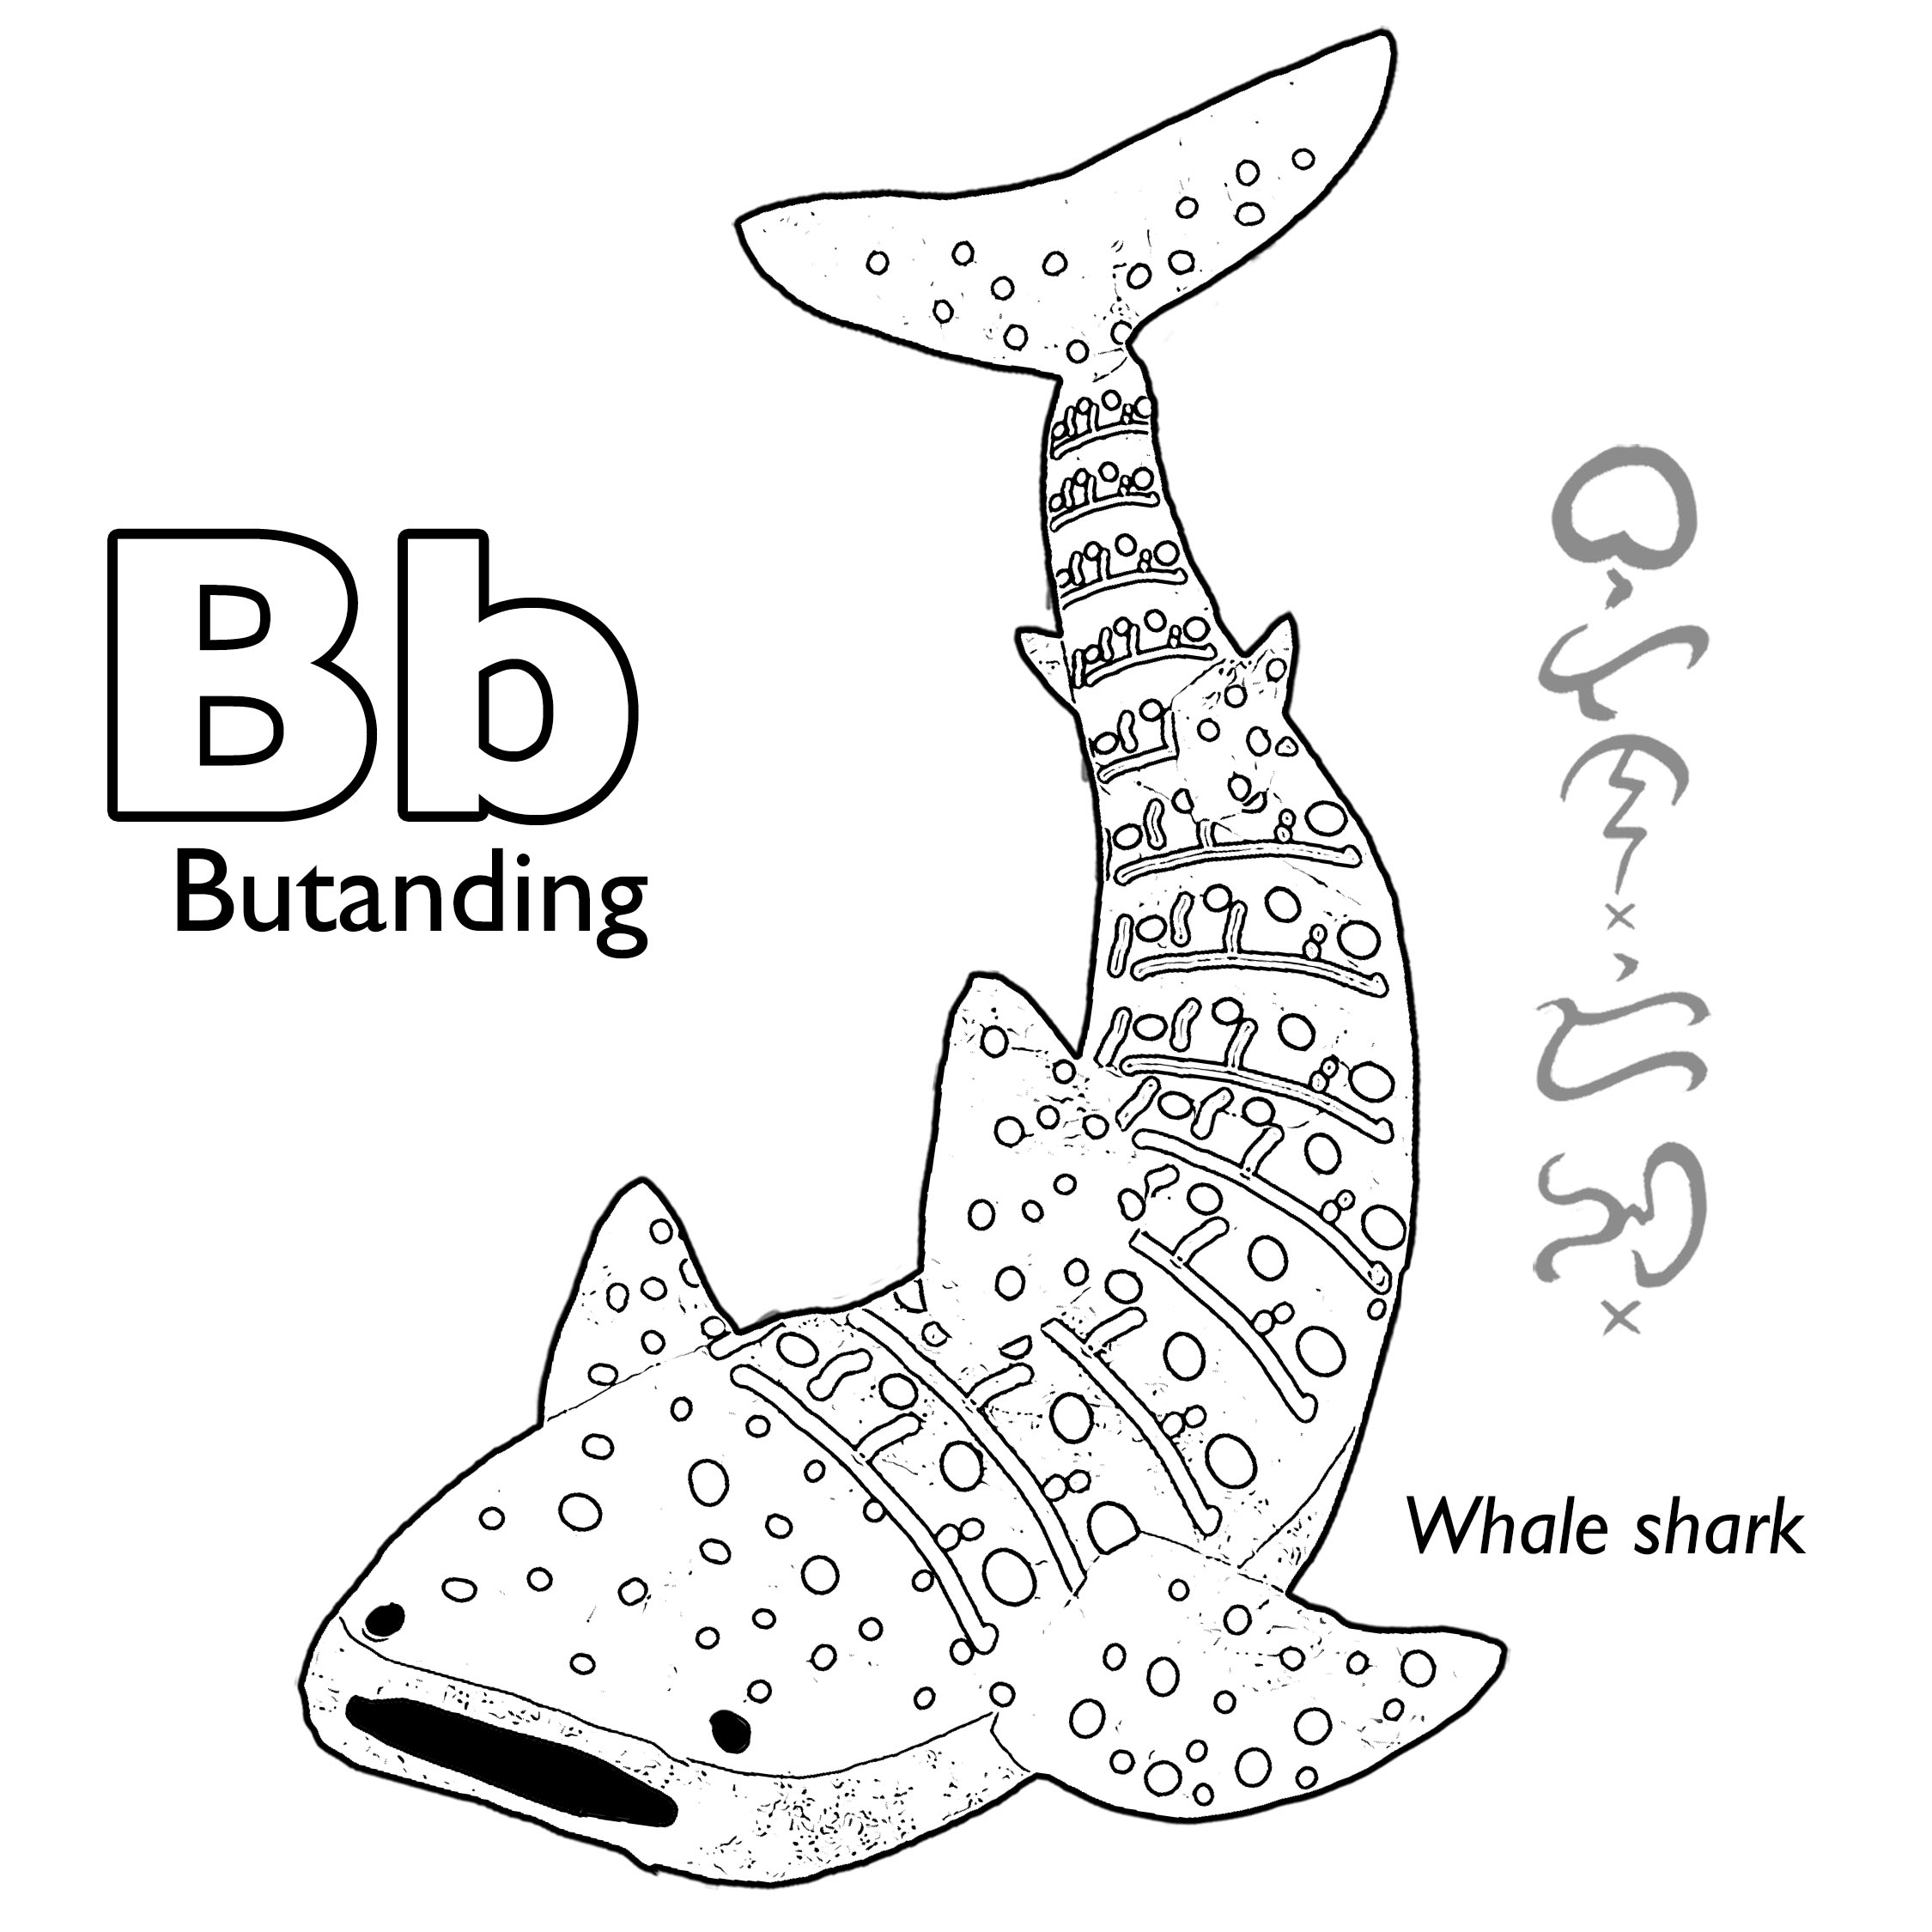 Butanding